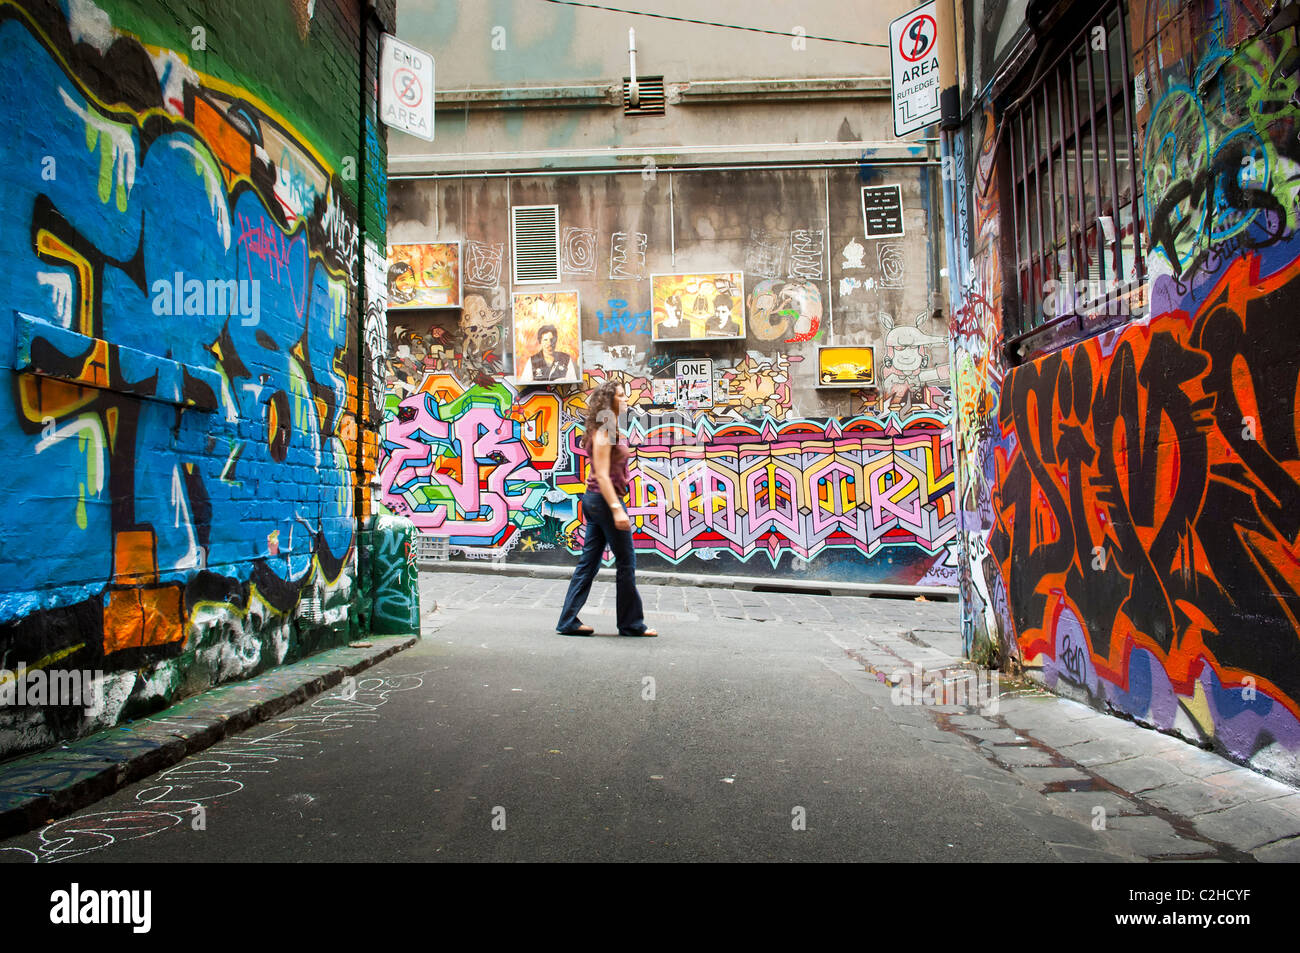 Graffiti wall chelmsford - Hosier Lane In Melbourne Australia Is Home To Legal Graffiti Stock Image